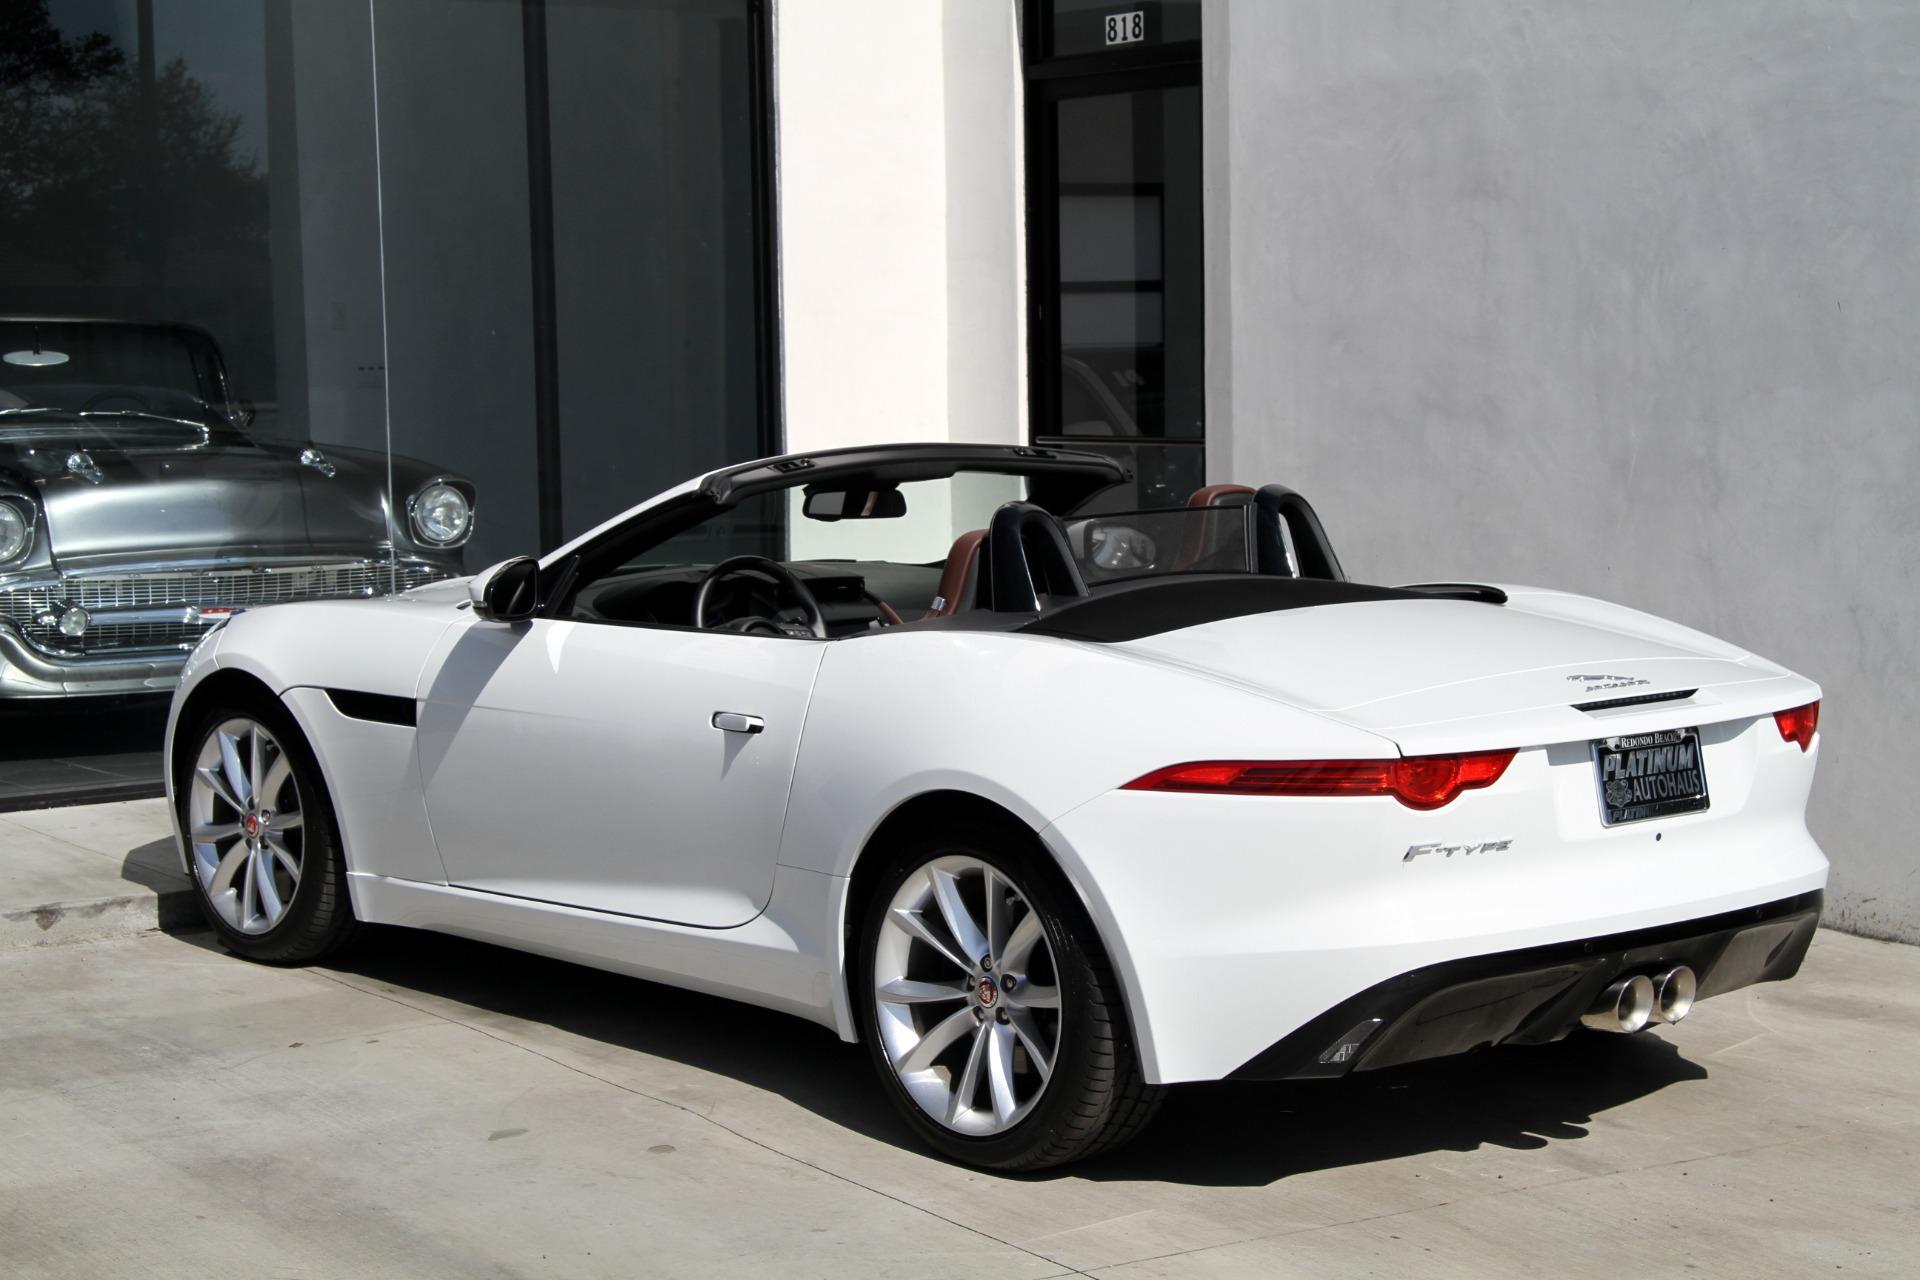 2016 jaguar f type s stock 6298a for sale near redondo beach ca ca jaguar dealer. Black Bedroom Furniture Sets. Home Design Ideas